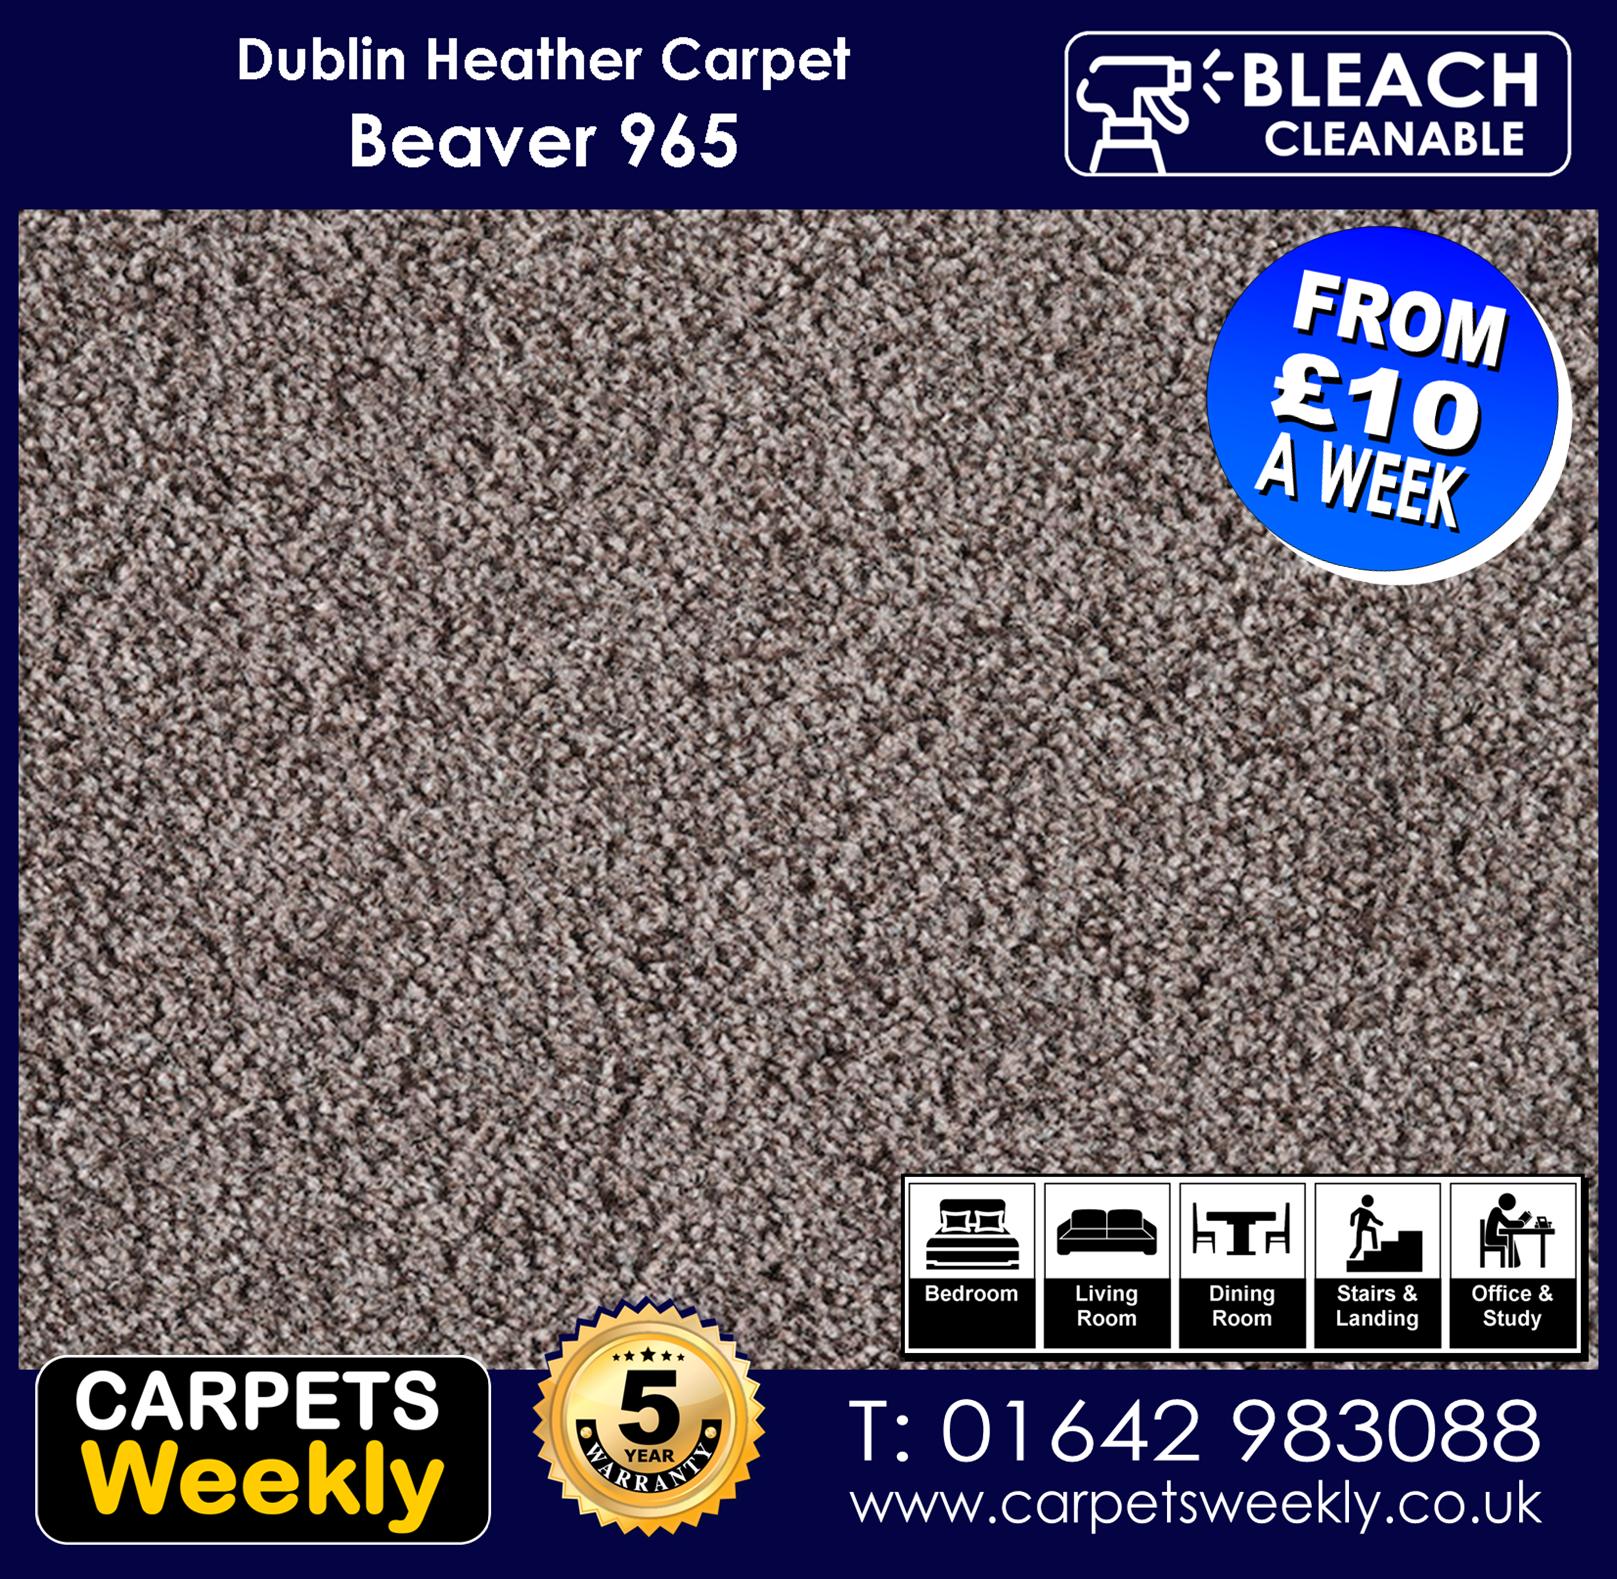 Carpets Weekly Dublin Heather Dublin Beaver - 965 mid range carpet